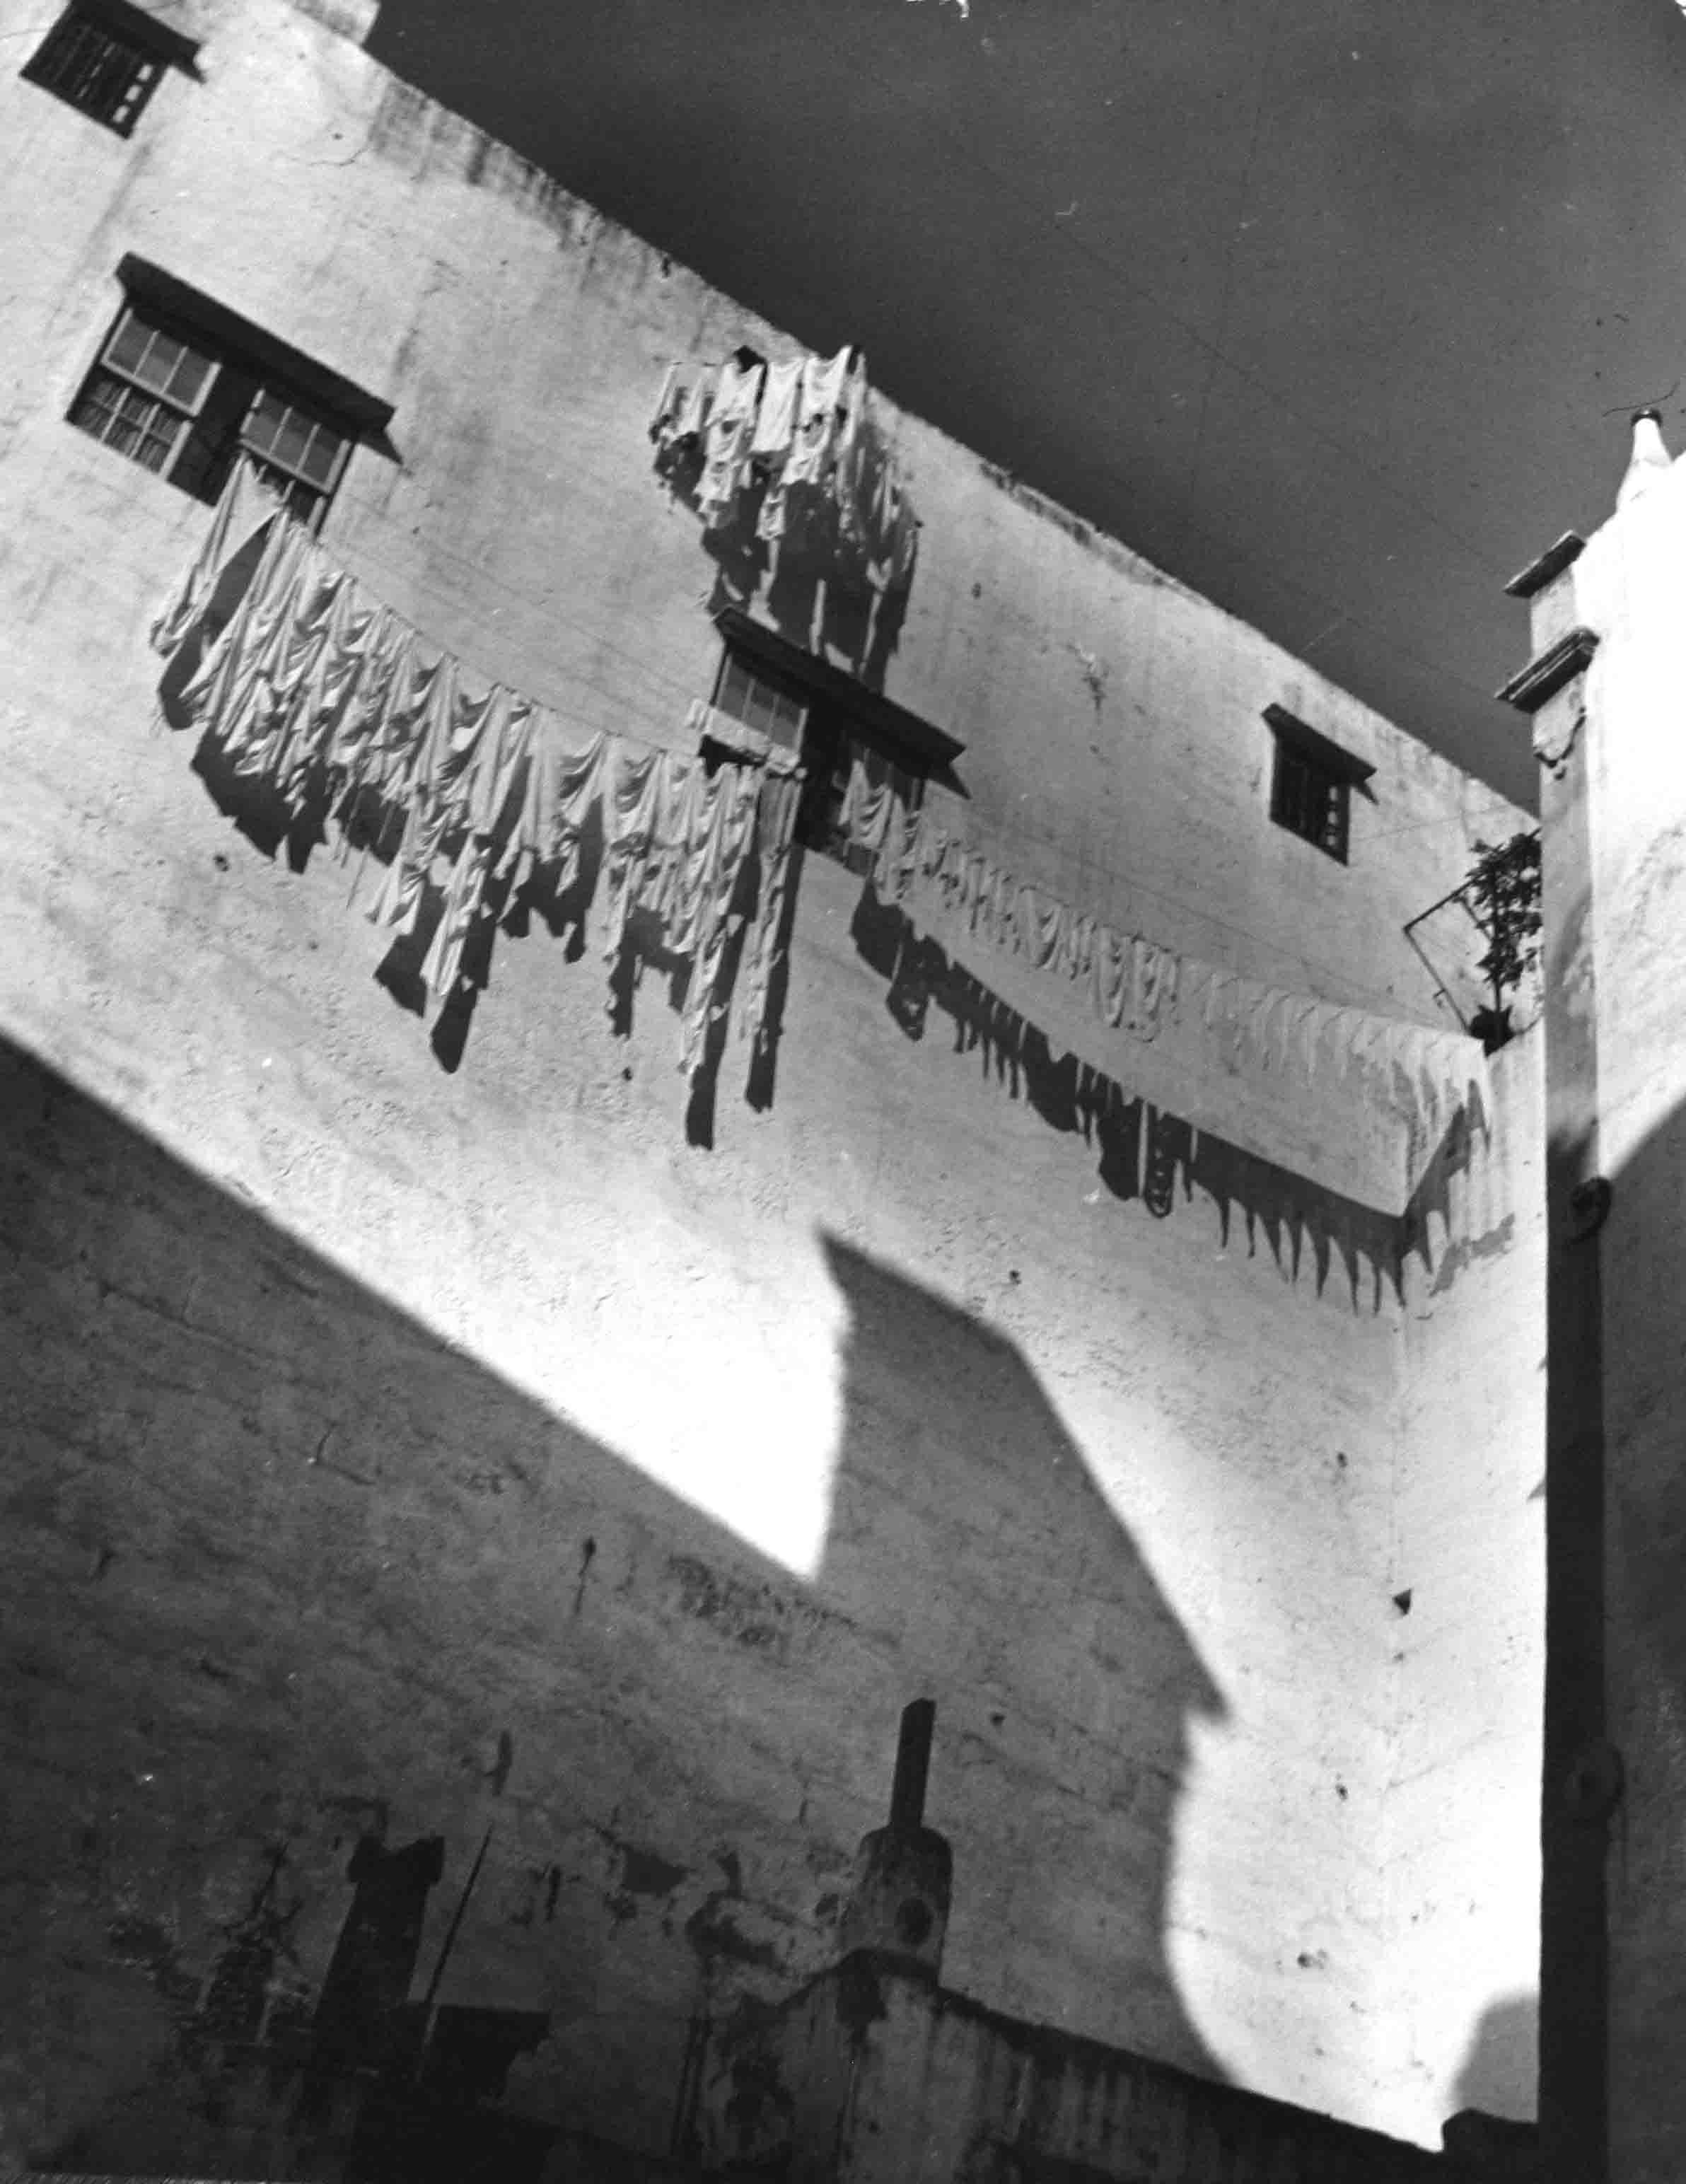 Ropa tendida al sol. Francia, 1939<br/>Gelatina de plata / Silver gelatin print